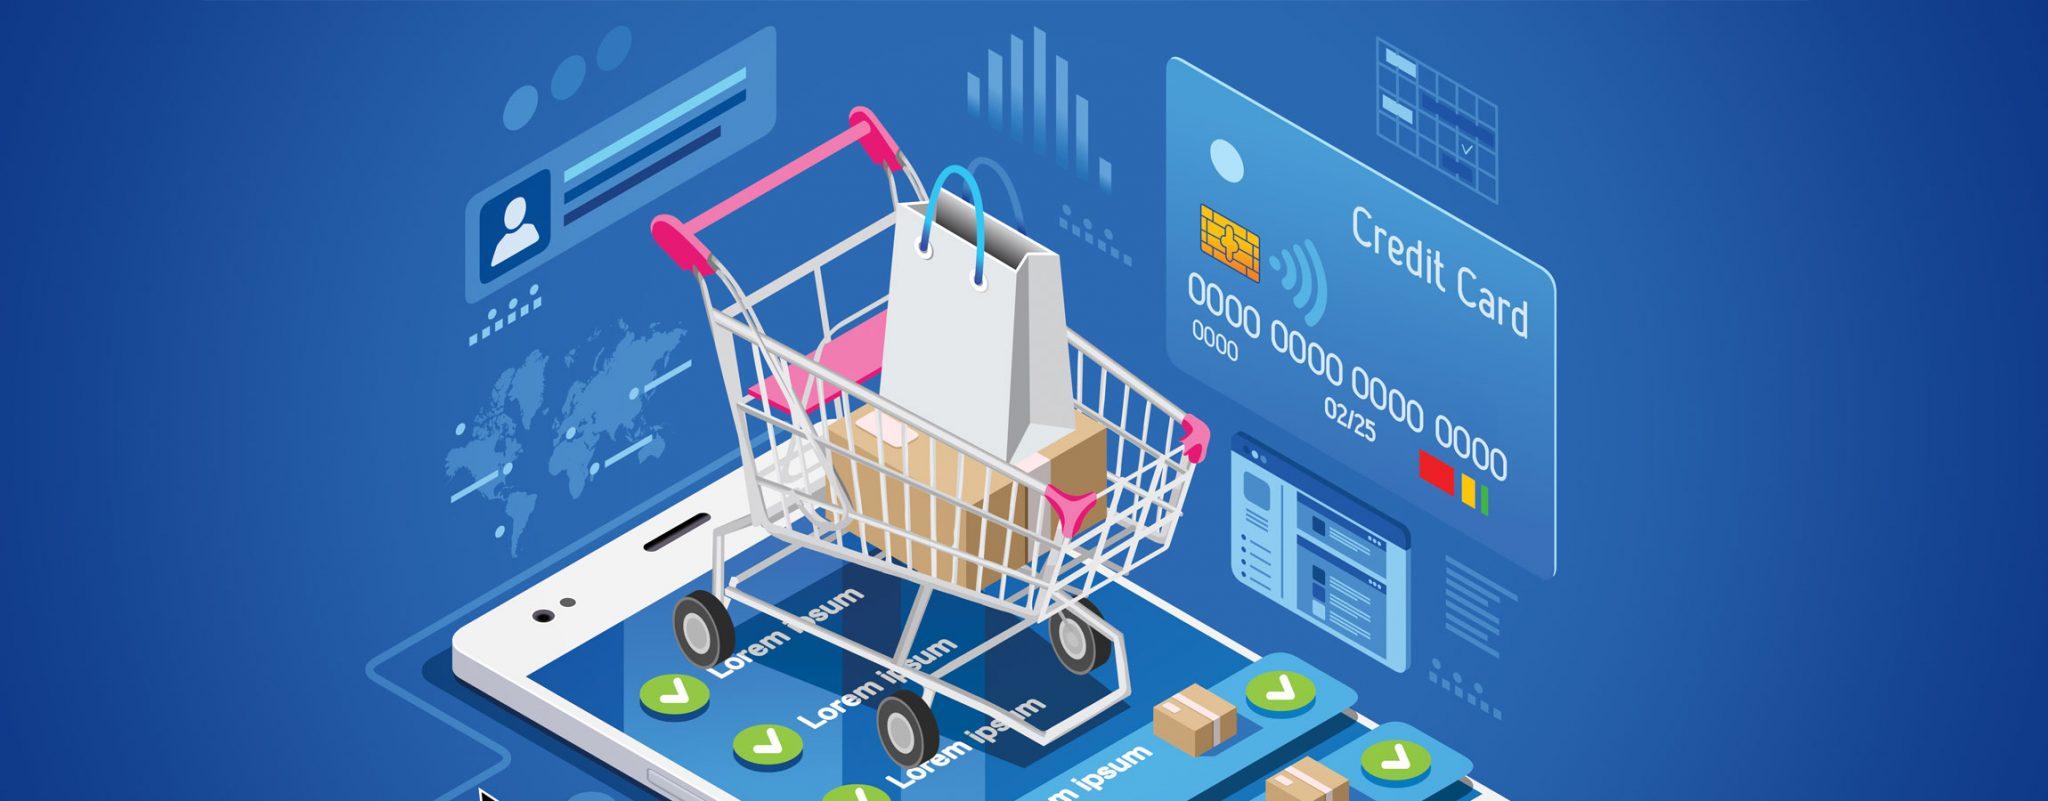 Acing e-commerce by bridging the digital gap